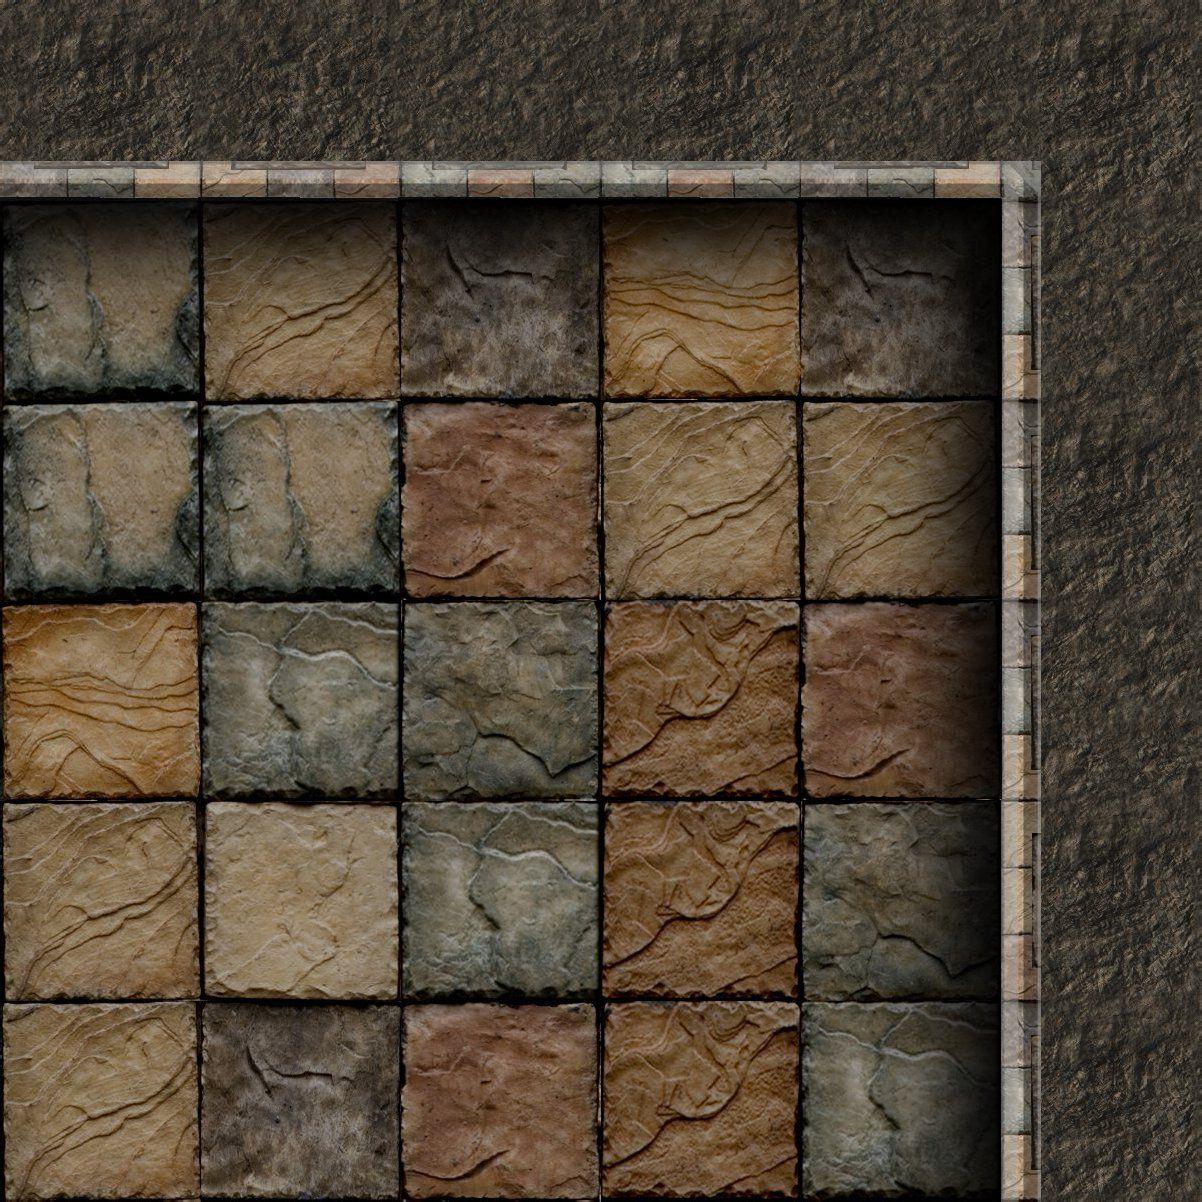 photograph regarding Printable Dungeon Tiles Pdf named 20+ Dungeon Surface Tiles Pics and Designs upon Weric